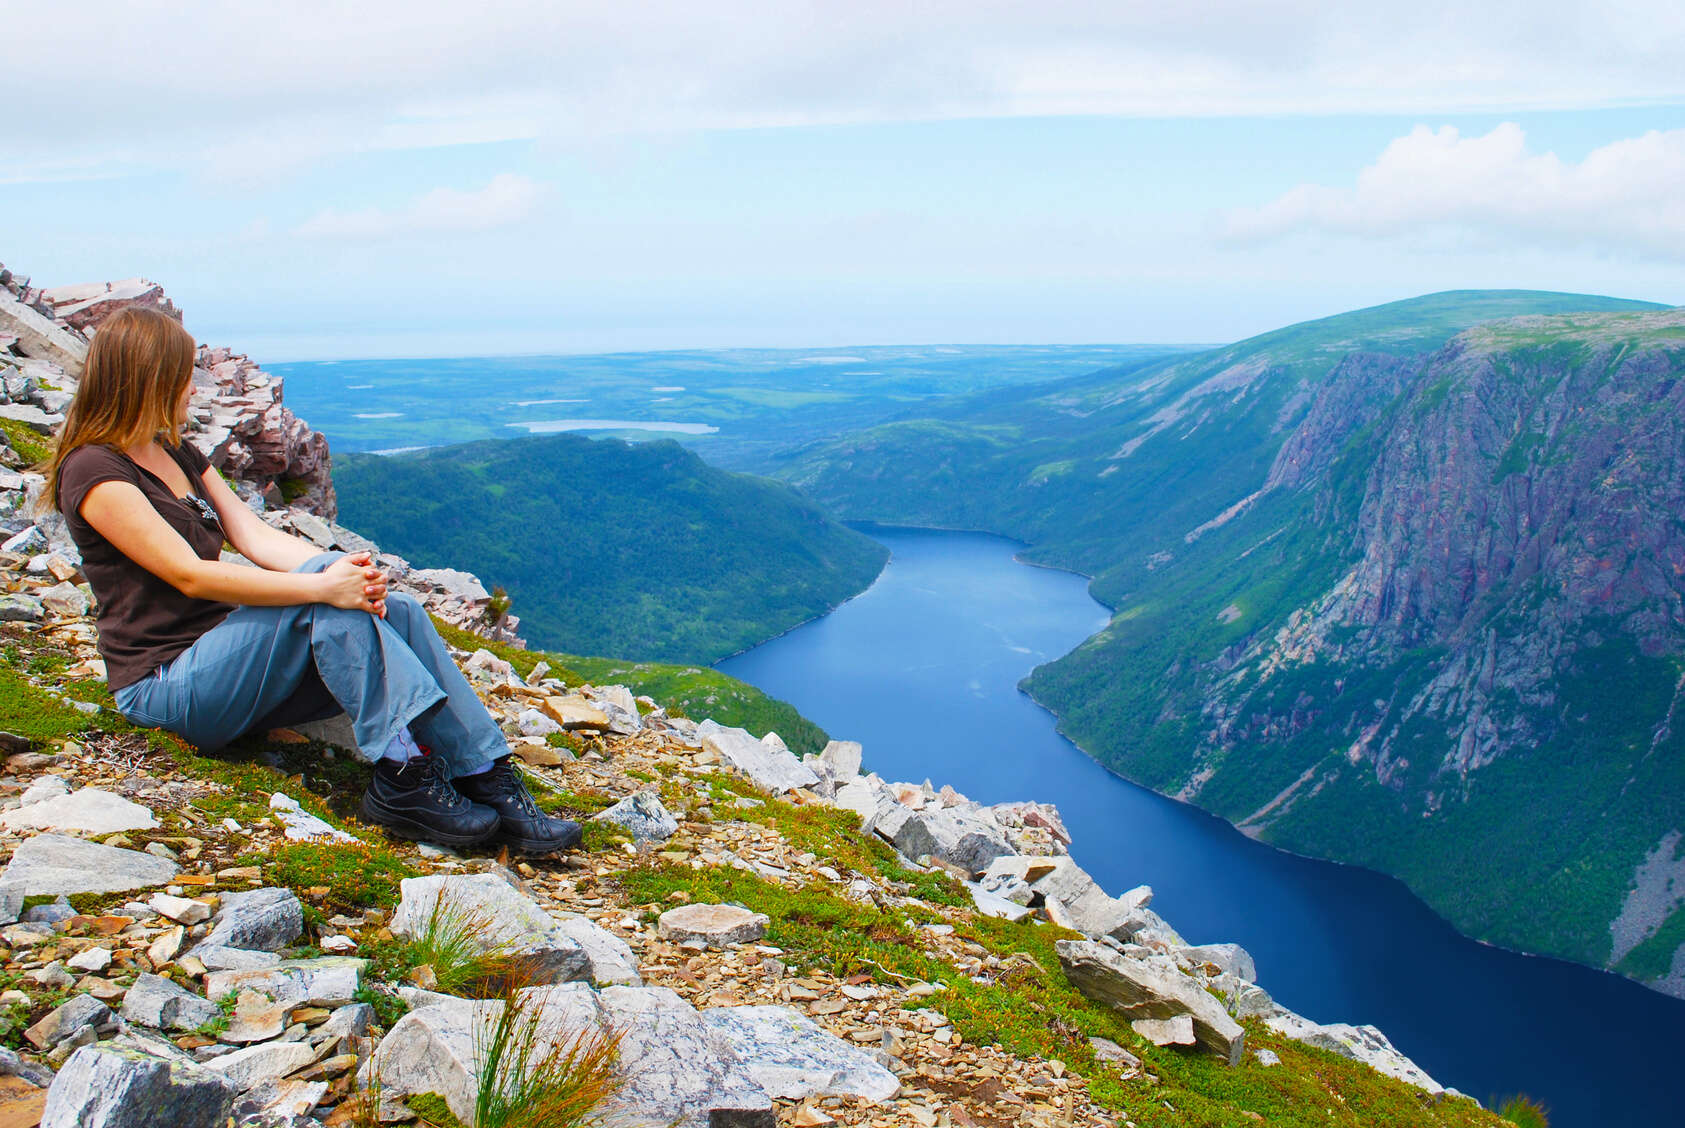 Gros Morne National Park, An Outdoor Enthusiast's Paradise